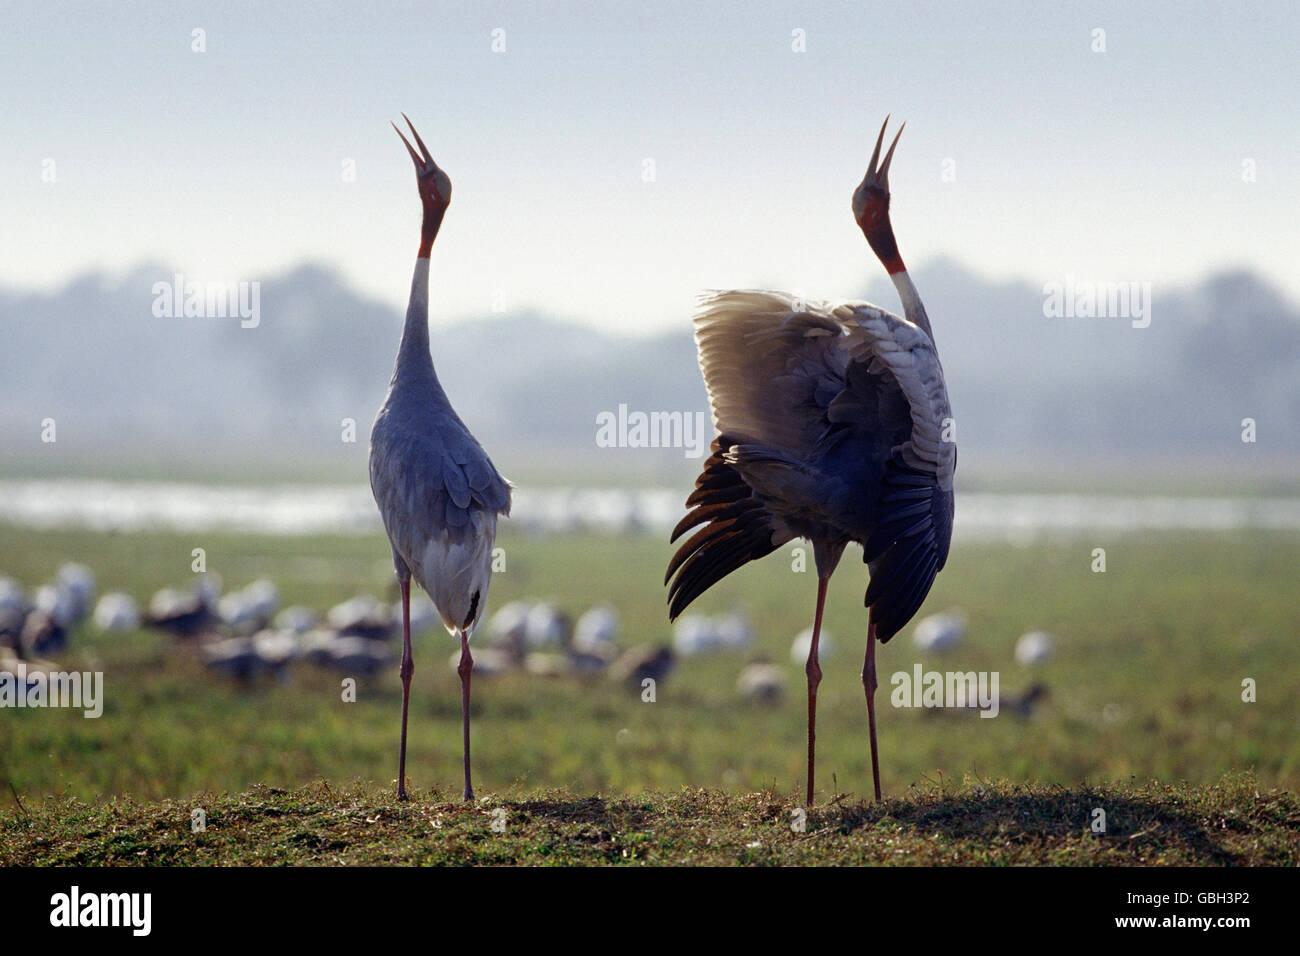 The image of Sarus cranes calling (  Grus antigone )was taken  Keoladev national park, India - Stock Image